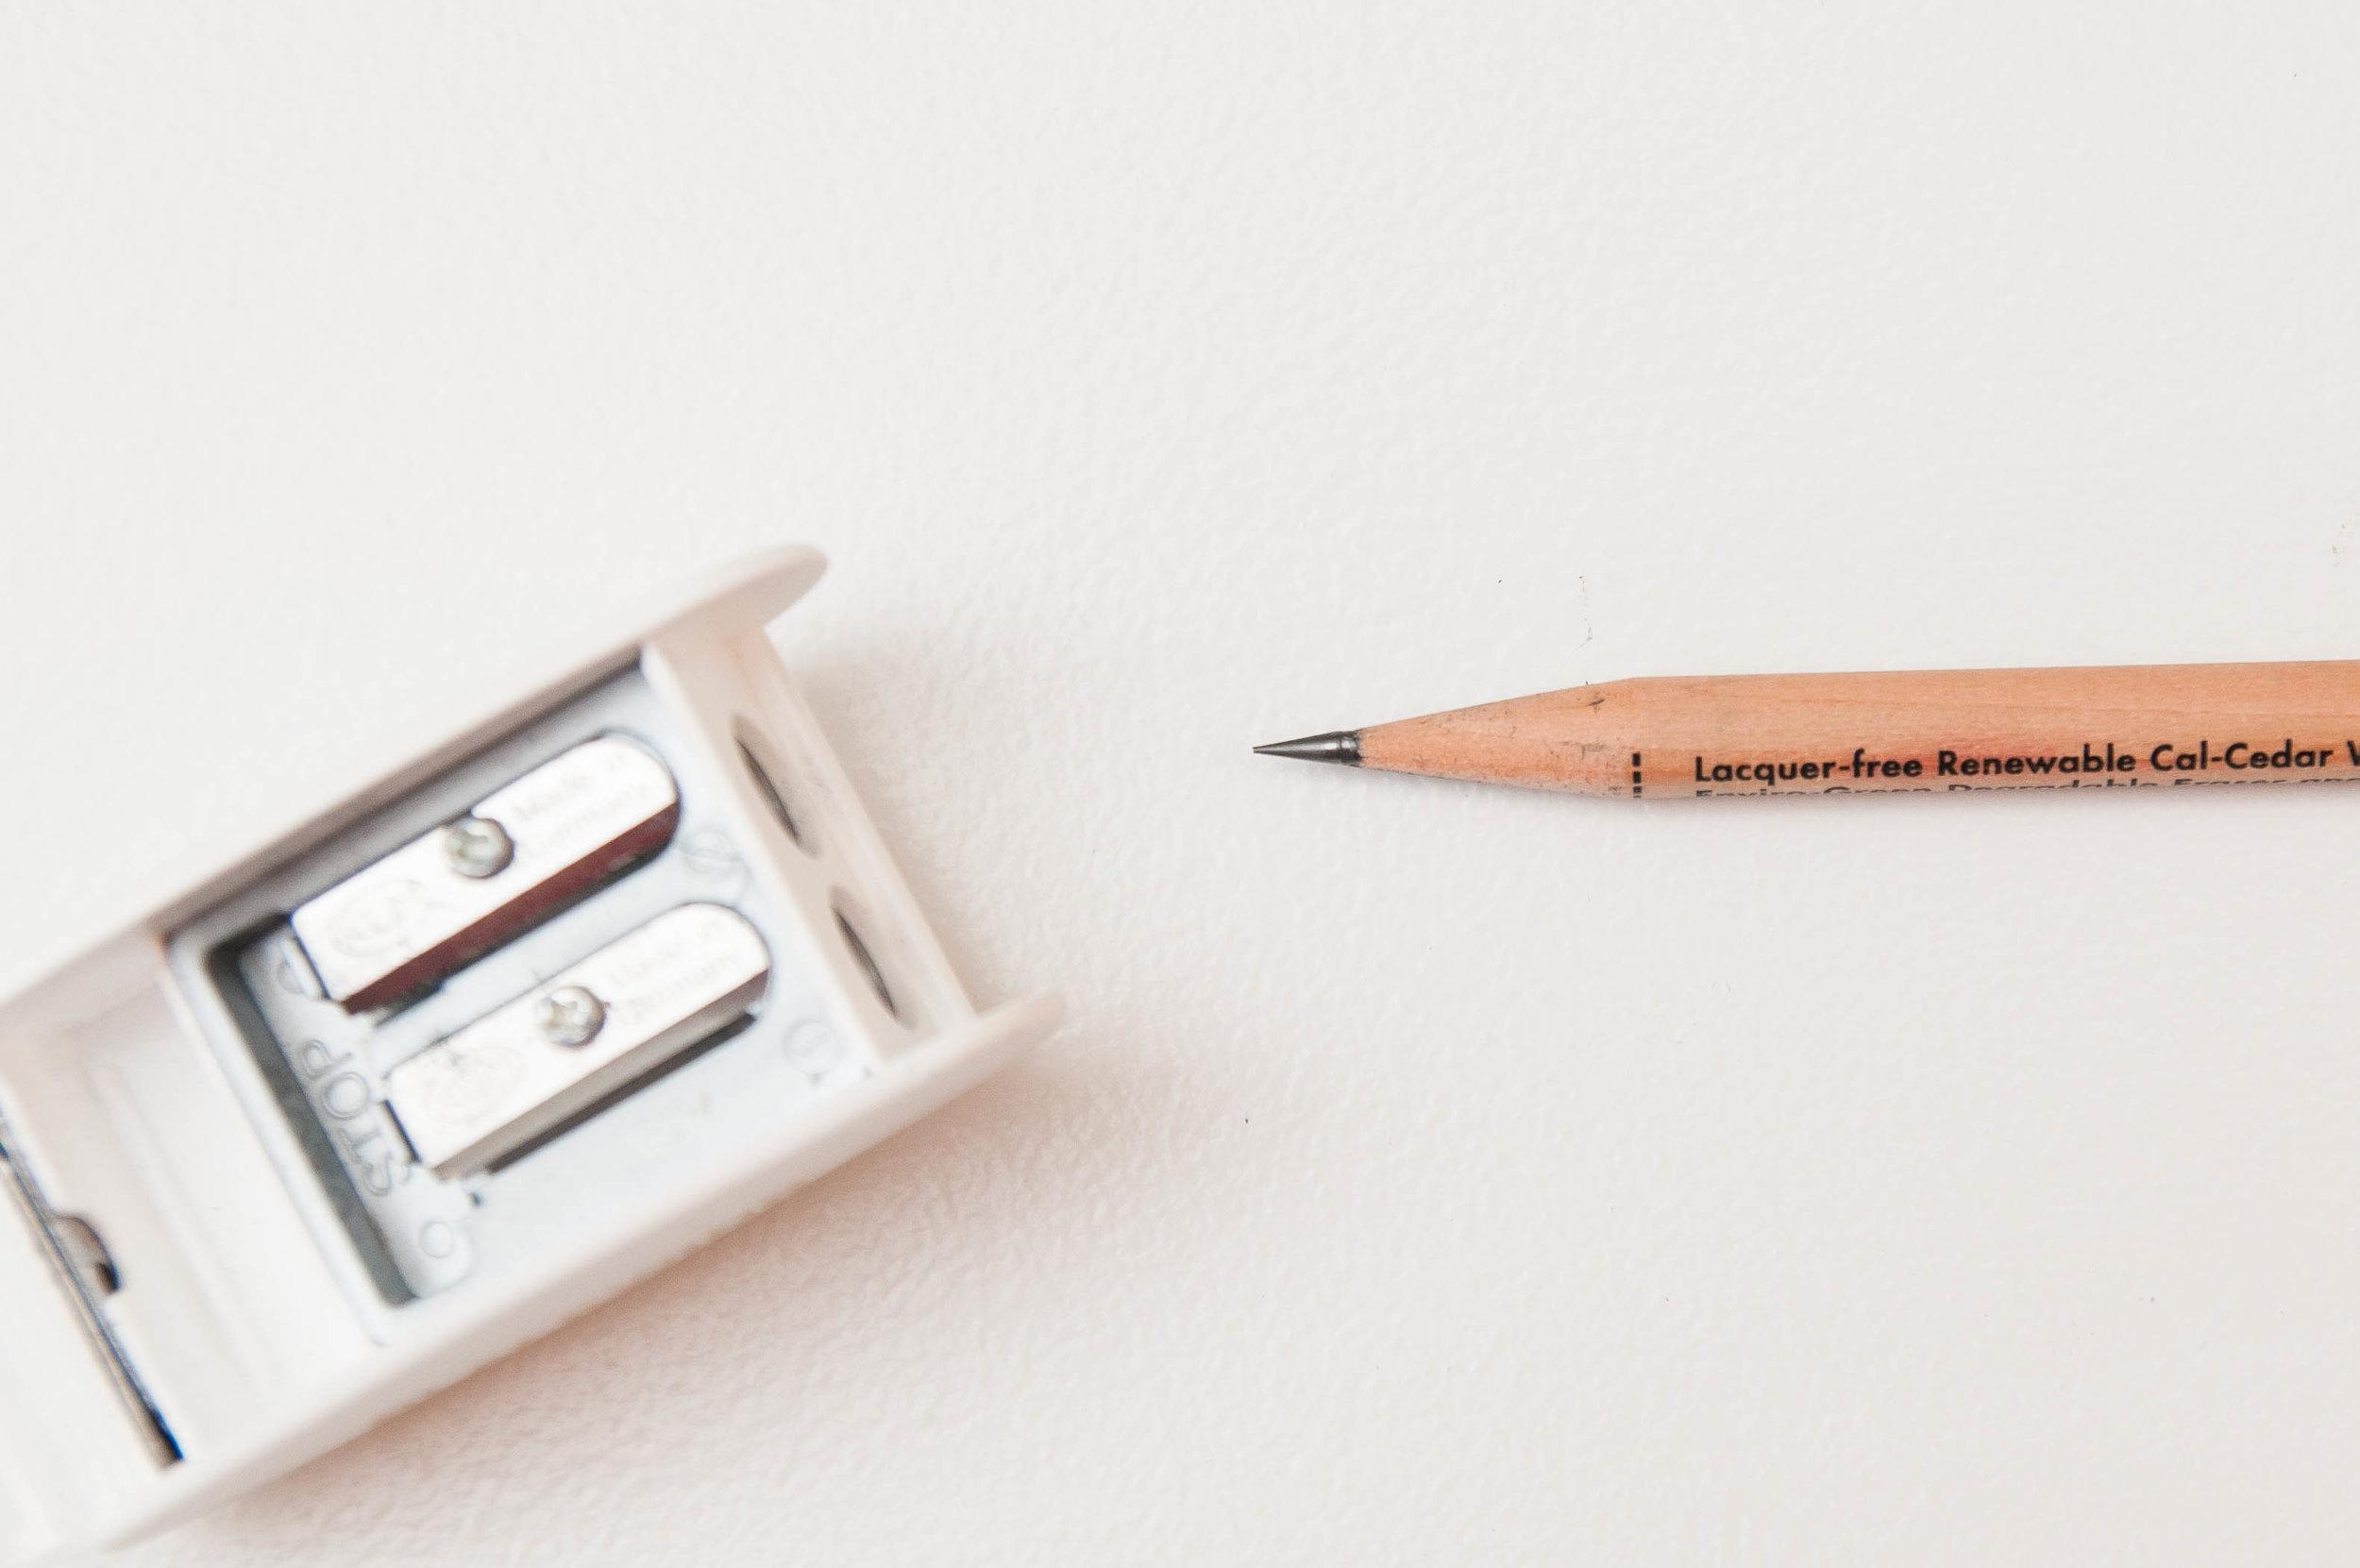 Palomino KUM Blackwing Long Point 2 Step Pencil Sharpener Step 2